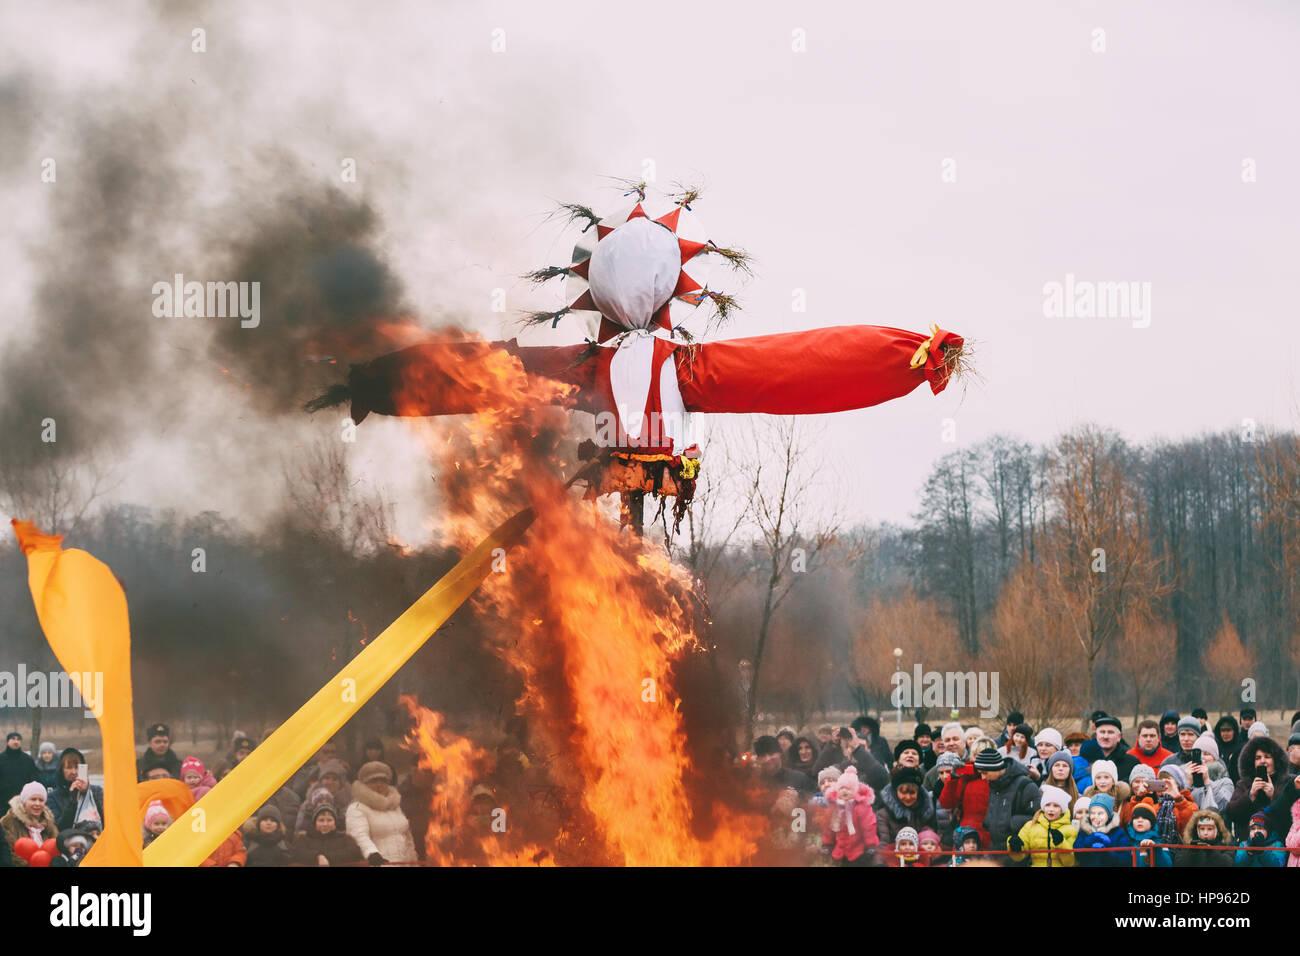 Gomel, Belarus - February 21, 2015: Burning effigies straw Maslenitsa in fire on the traditional holiday dedicated - Stock Image